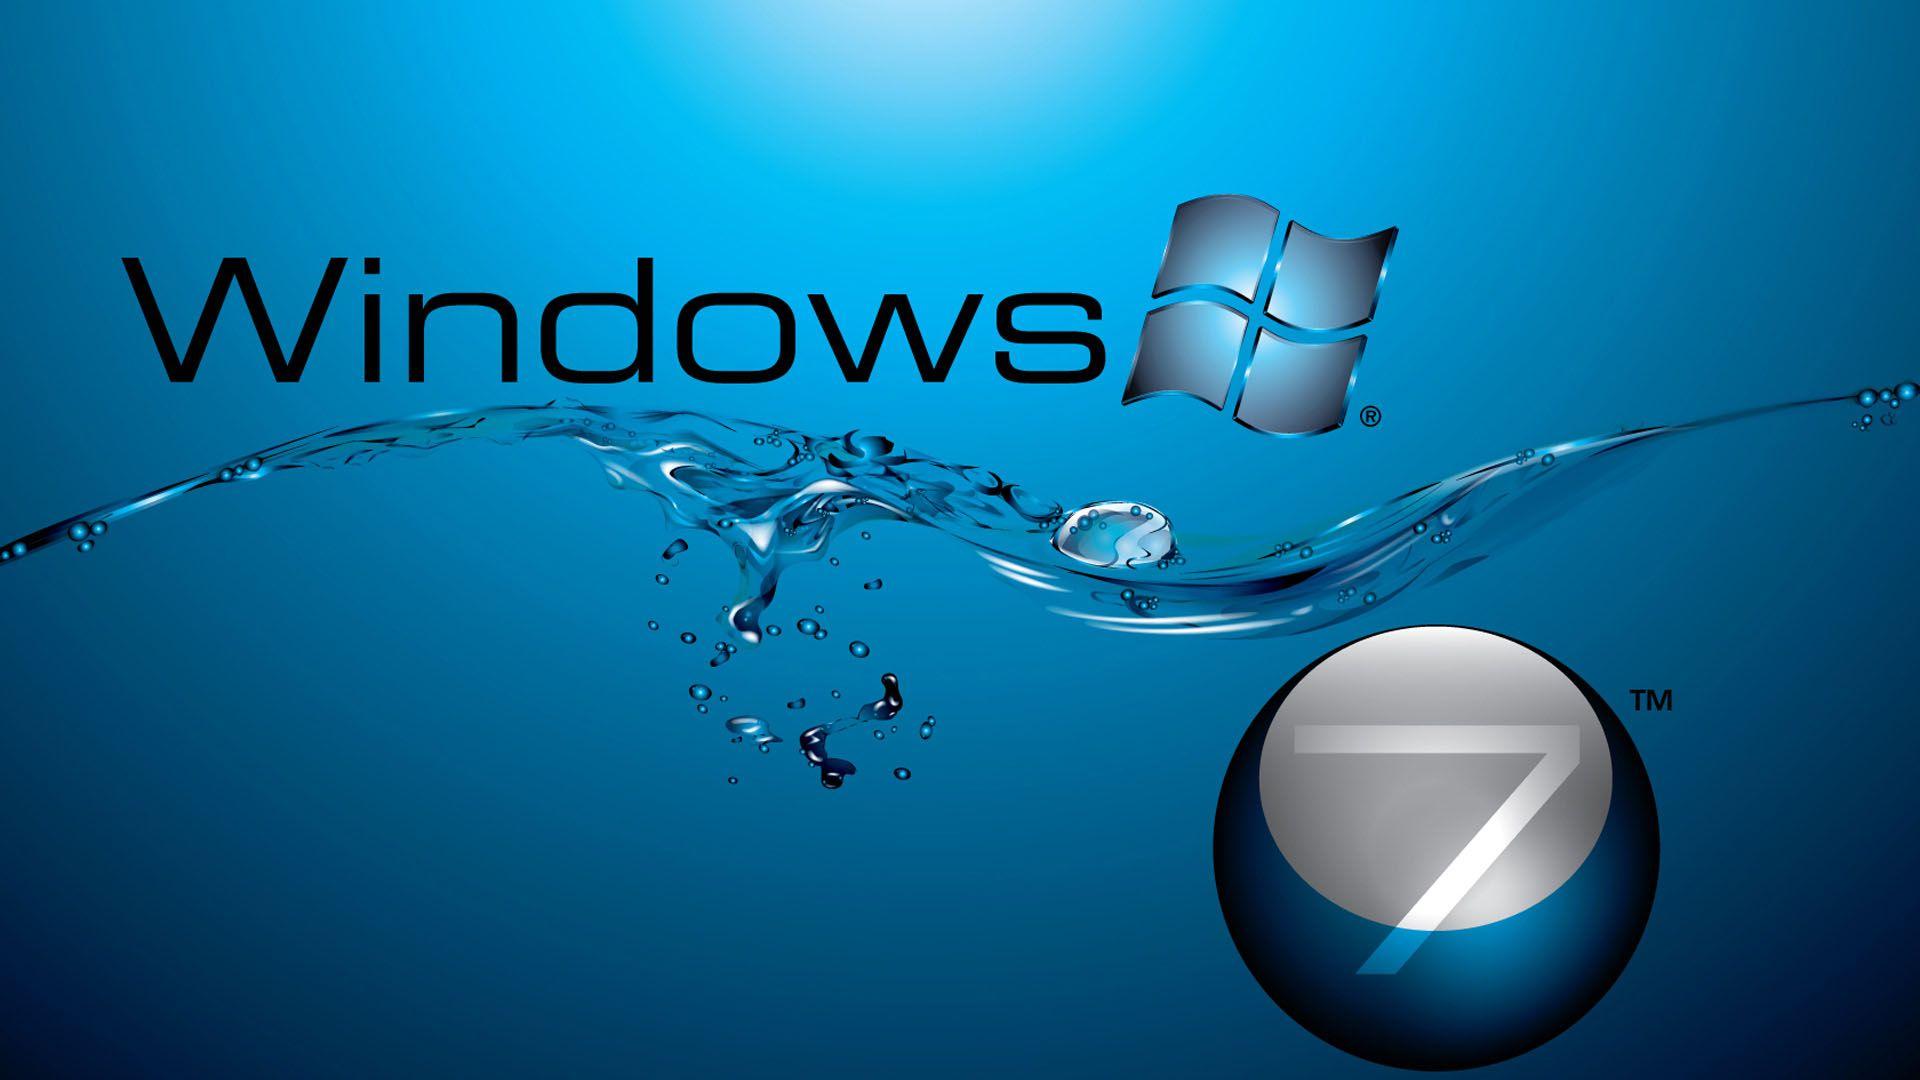 Windows 7 In Water Flow 1920 215 1080 Hd 1080p Wallpaper Descargar Fondos De Pantalla Para Pc Fondos Pantalla Windows 10 Fondo Windows